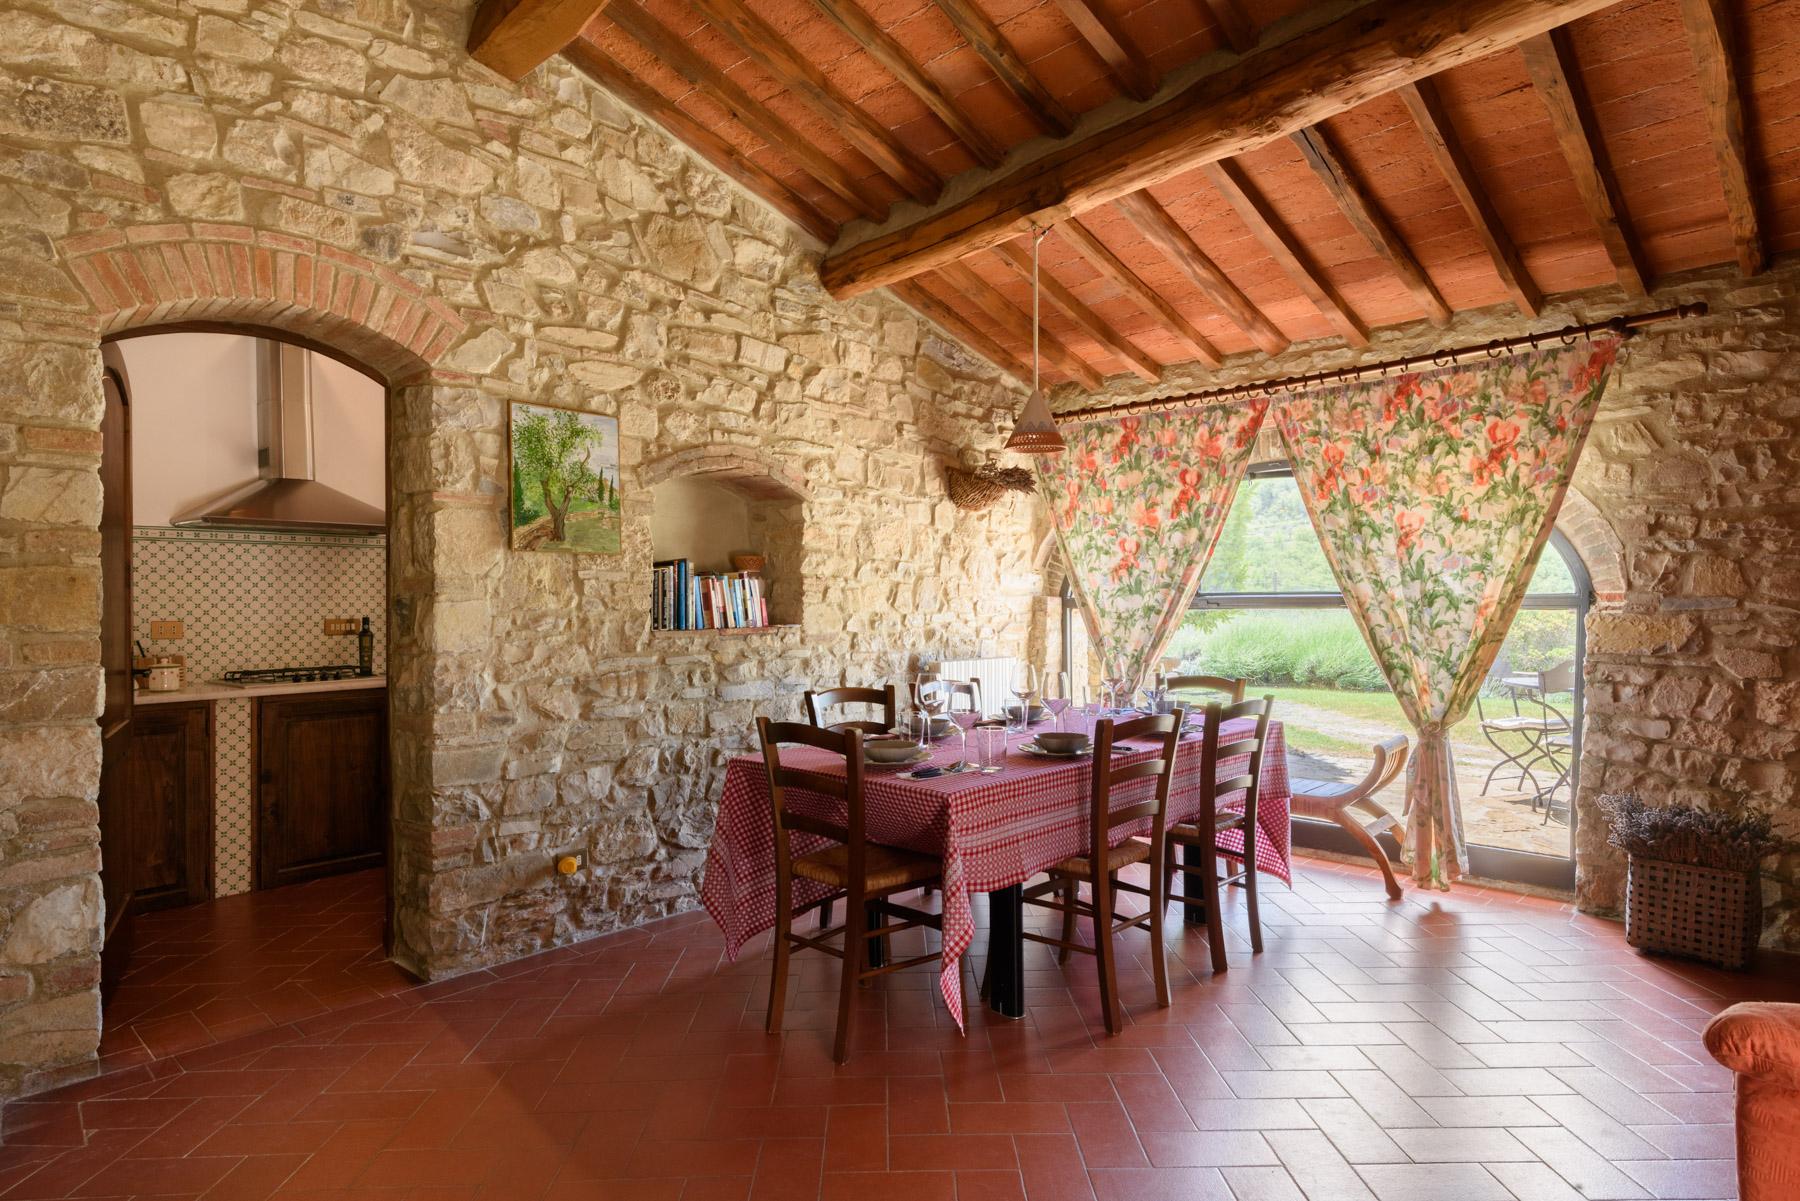 Rustico in Vendita a Castellina In Chianti: 5 locali, 650 mq - Foto 15